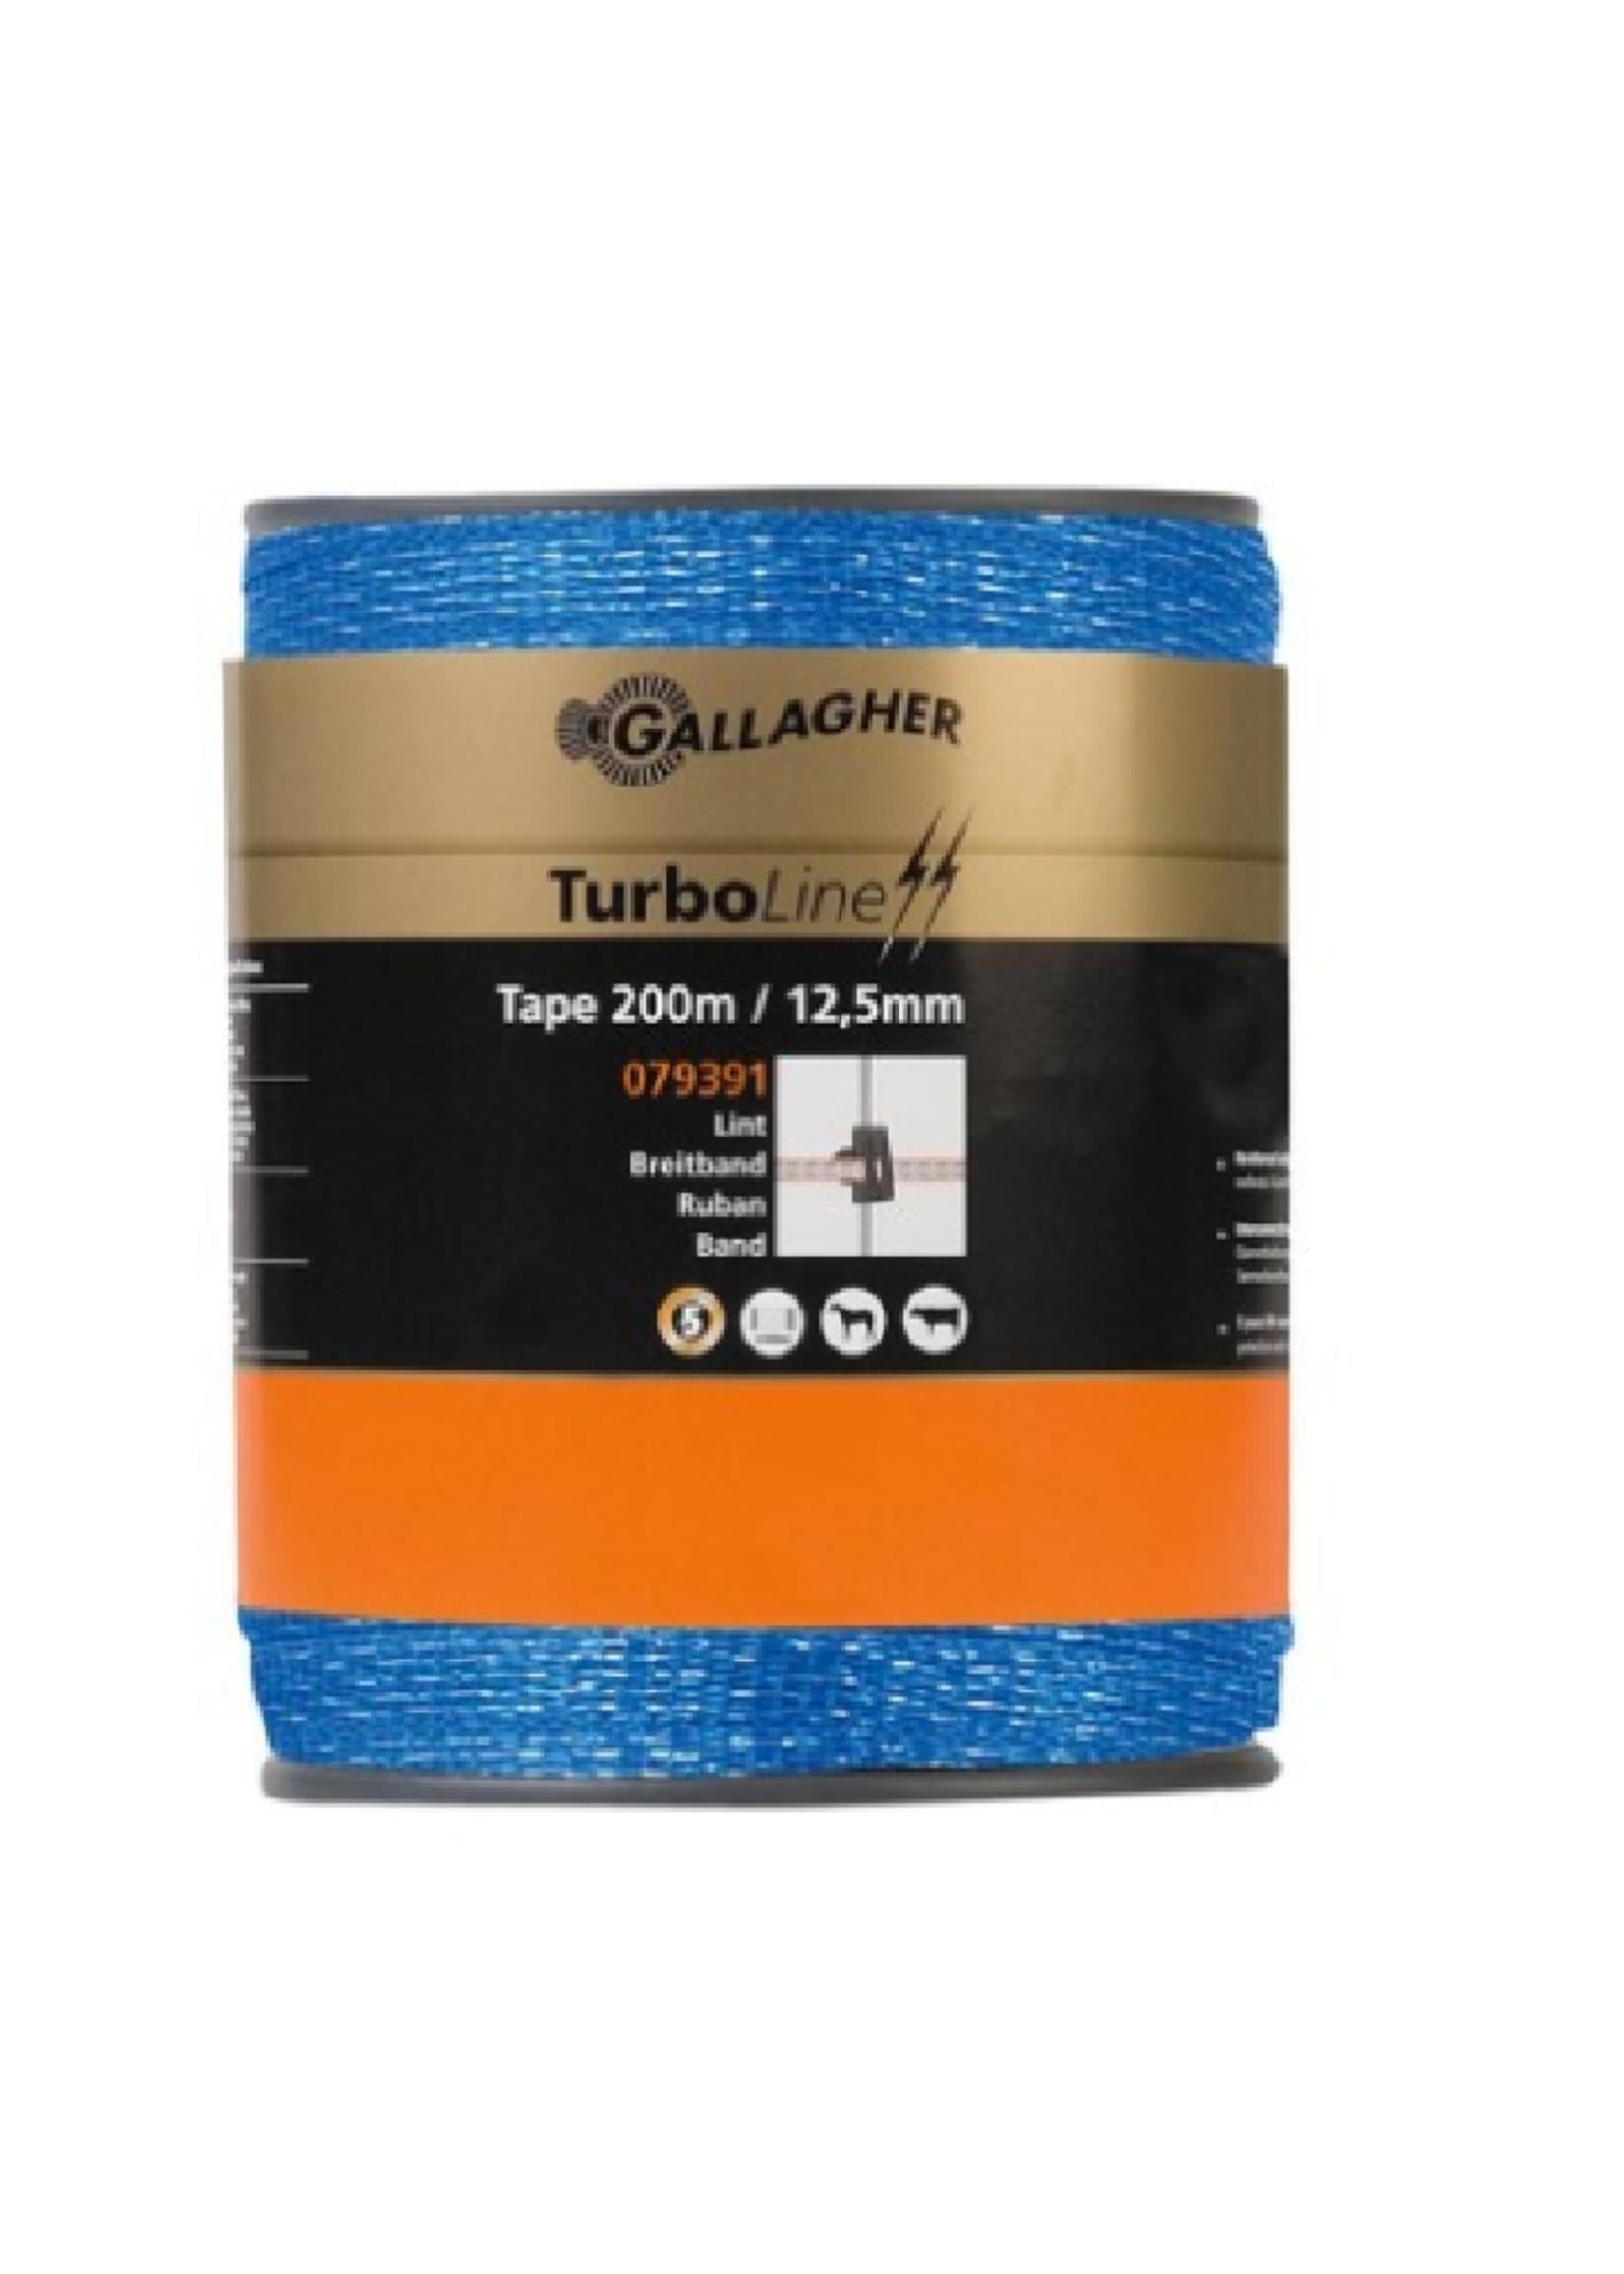 Gallagher Gallagher lint 200m / 12.5mm blauw